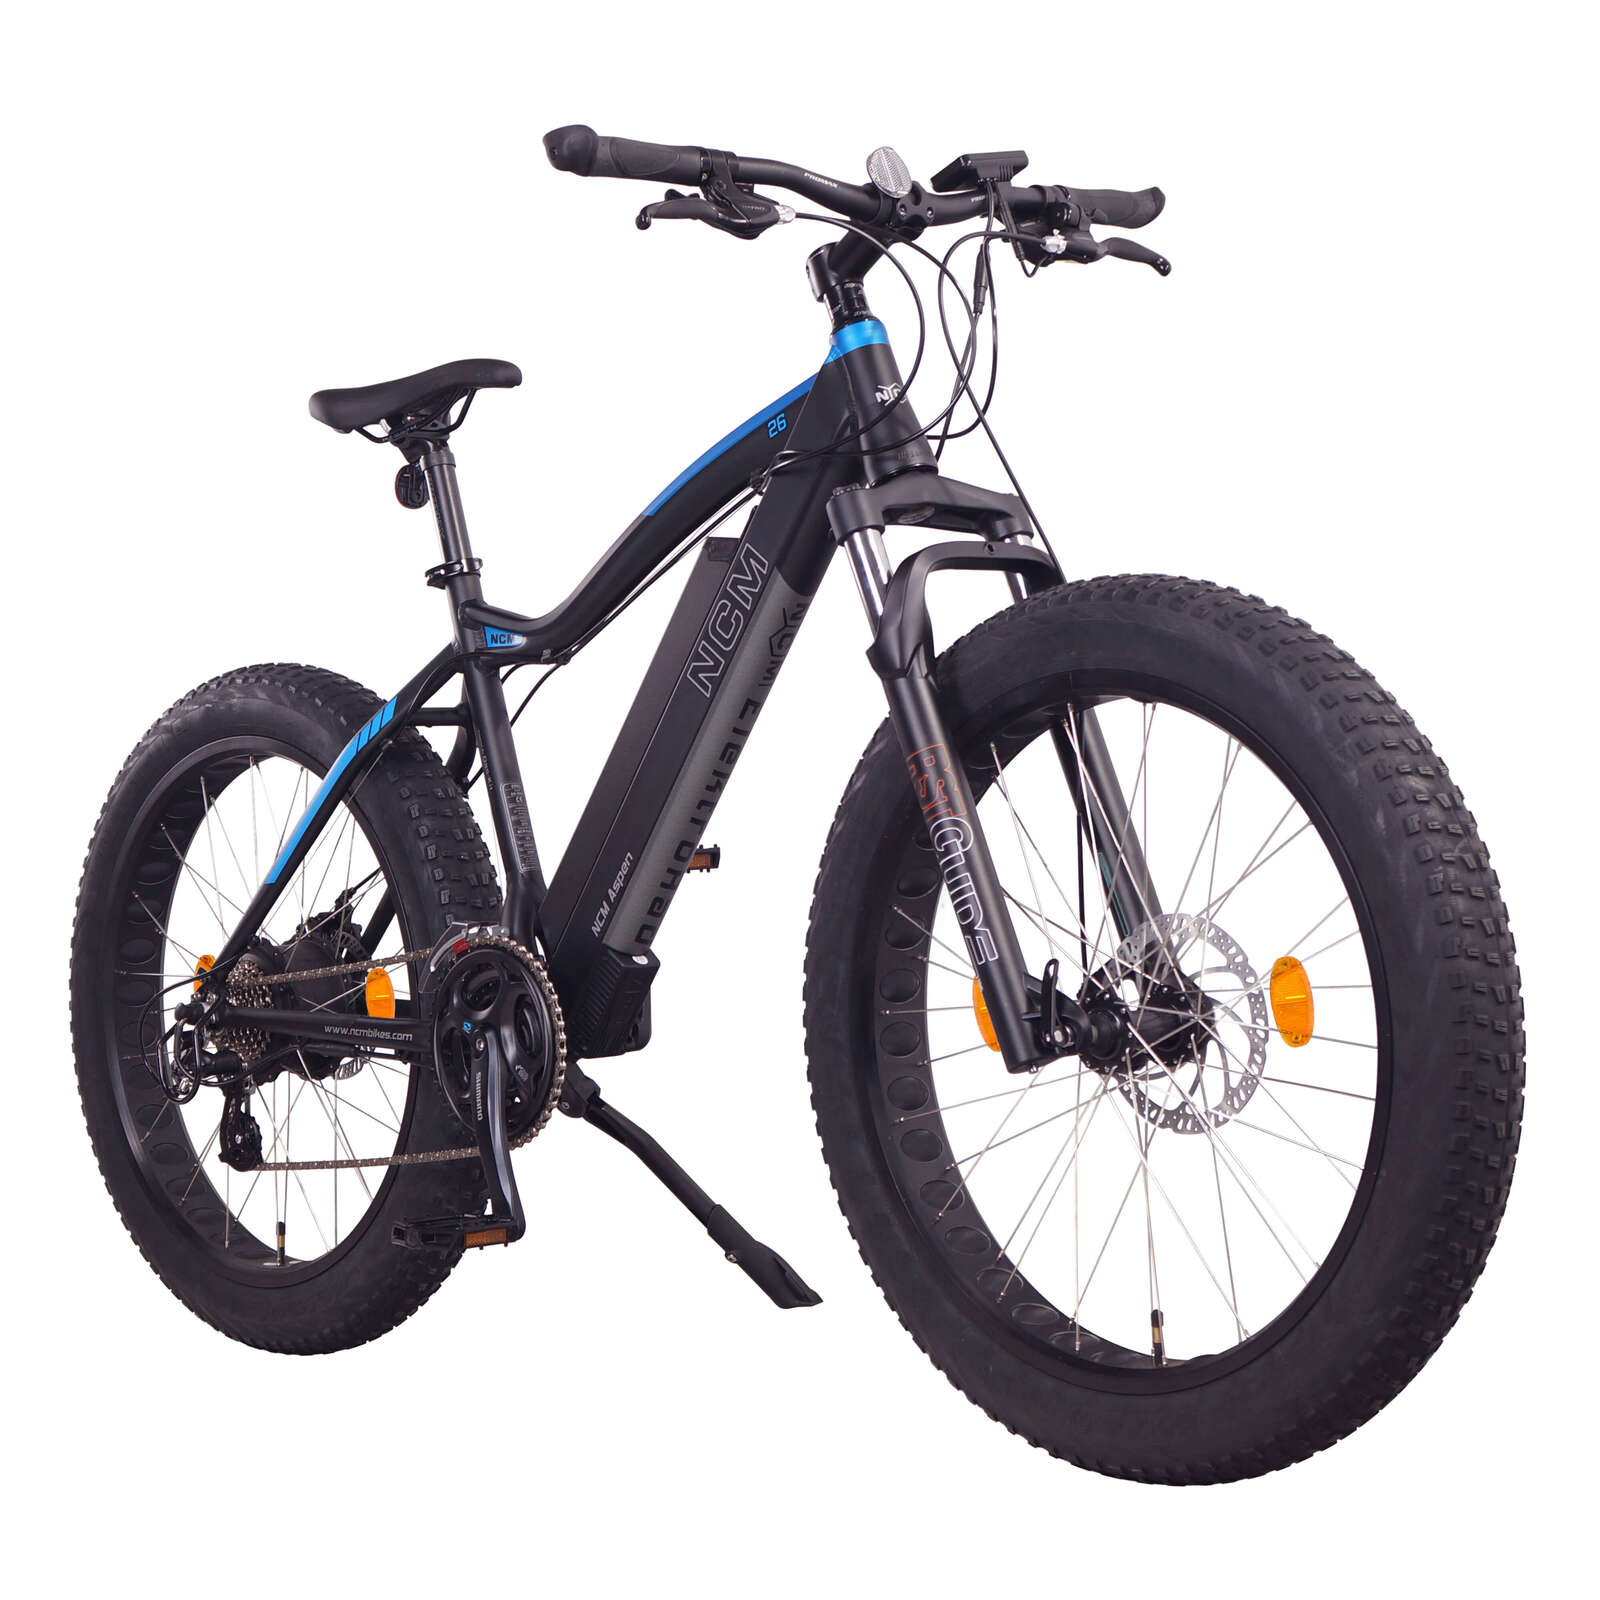 E-bike Sunshine Coast NCM Aspen Fat Electric Bike,E-Bike ,48V 13Ah 250W, E-MTB 624Wh Battery